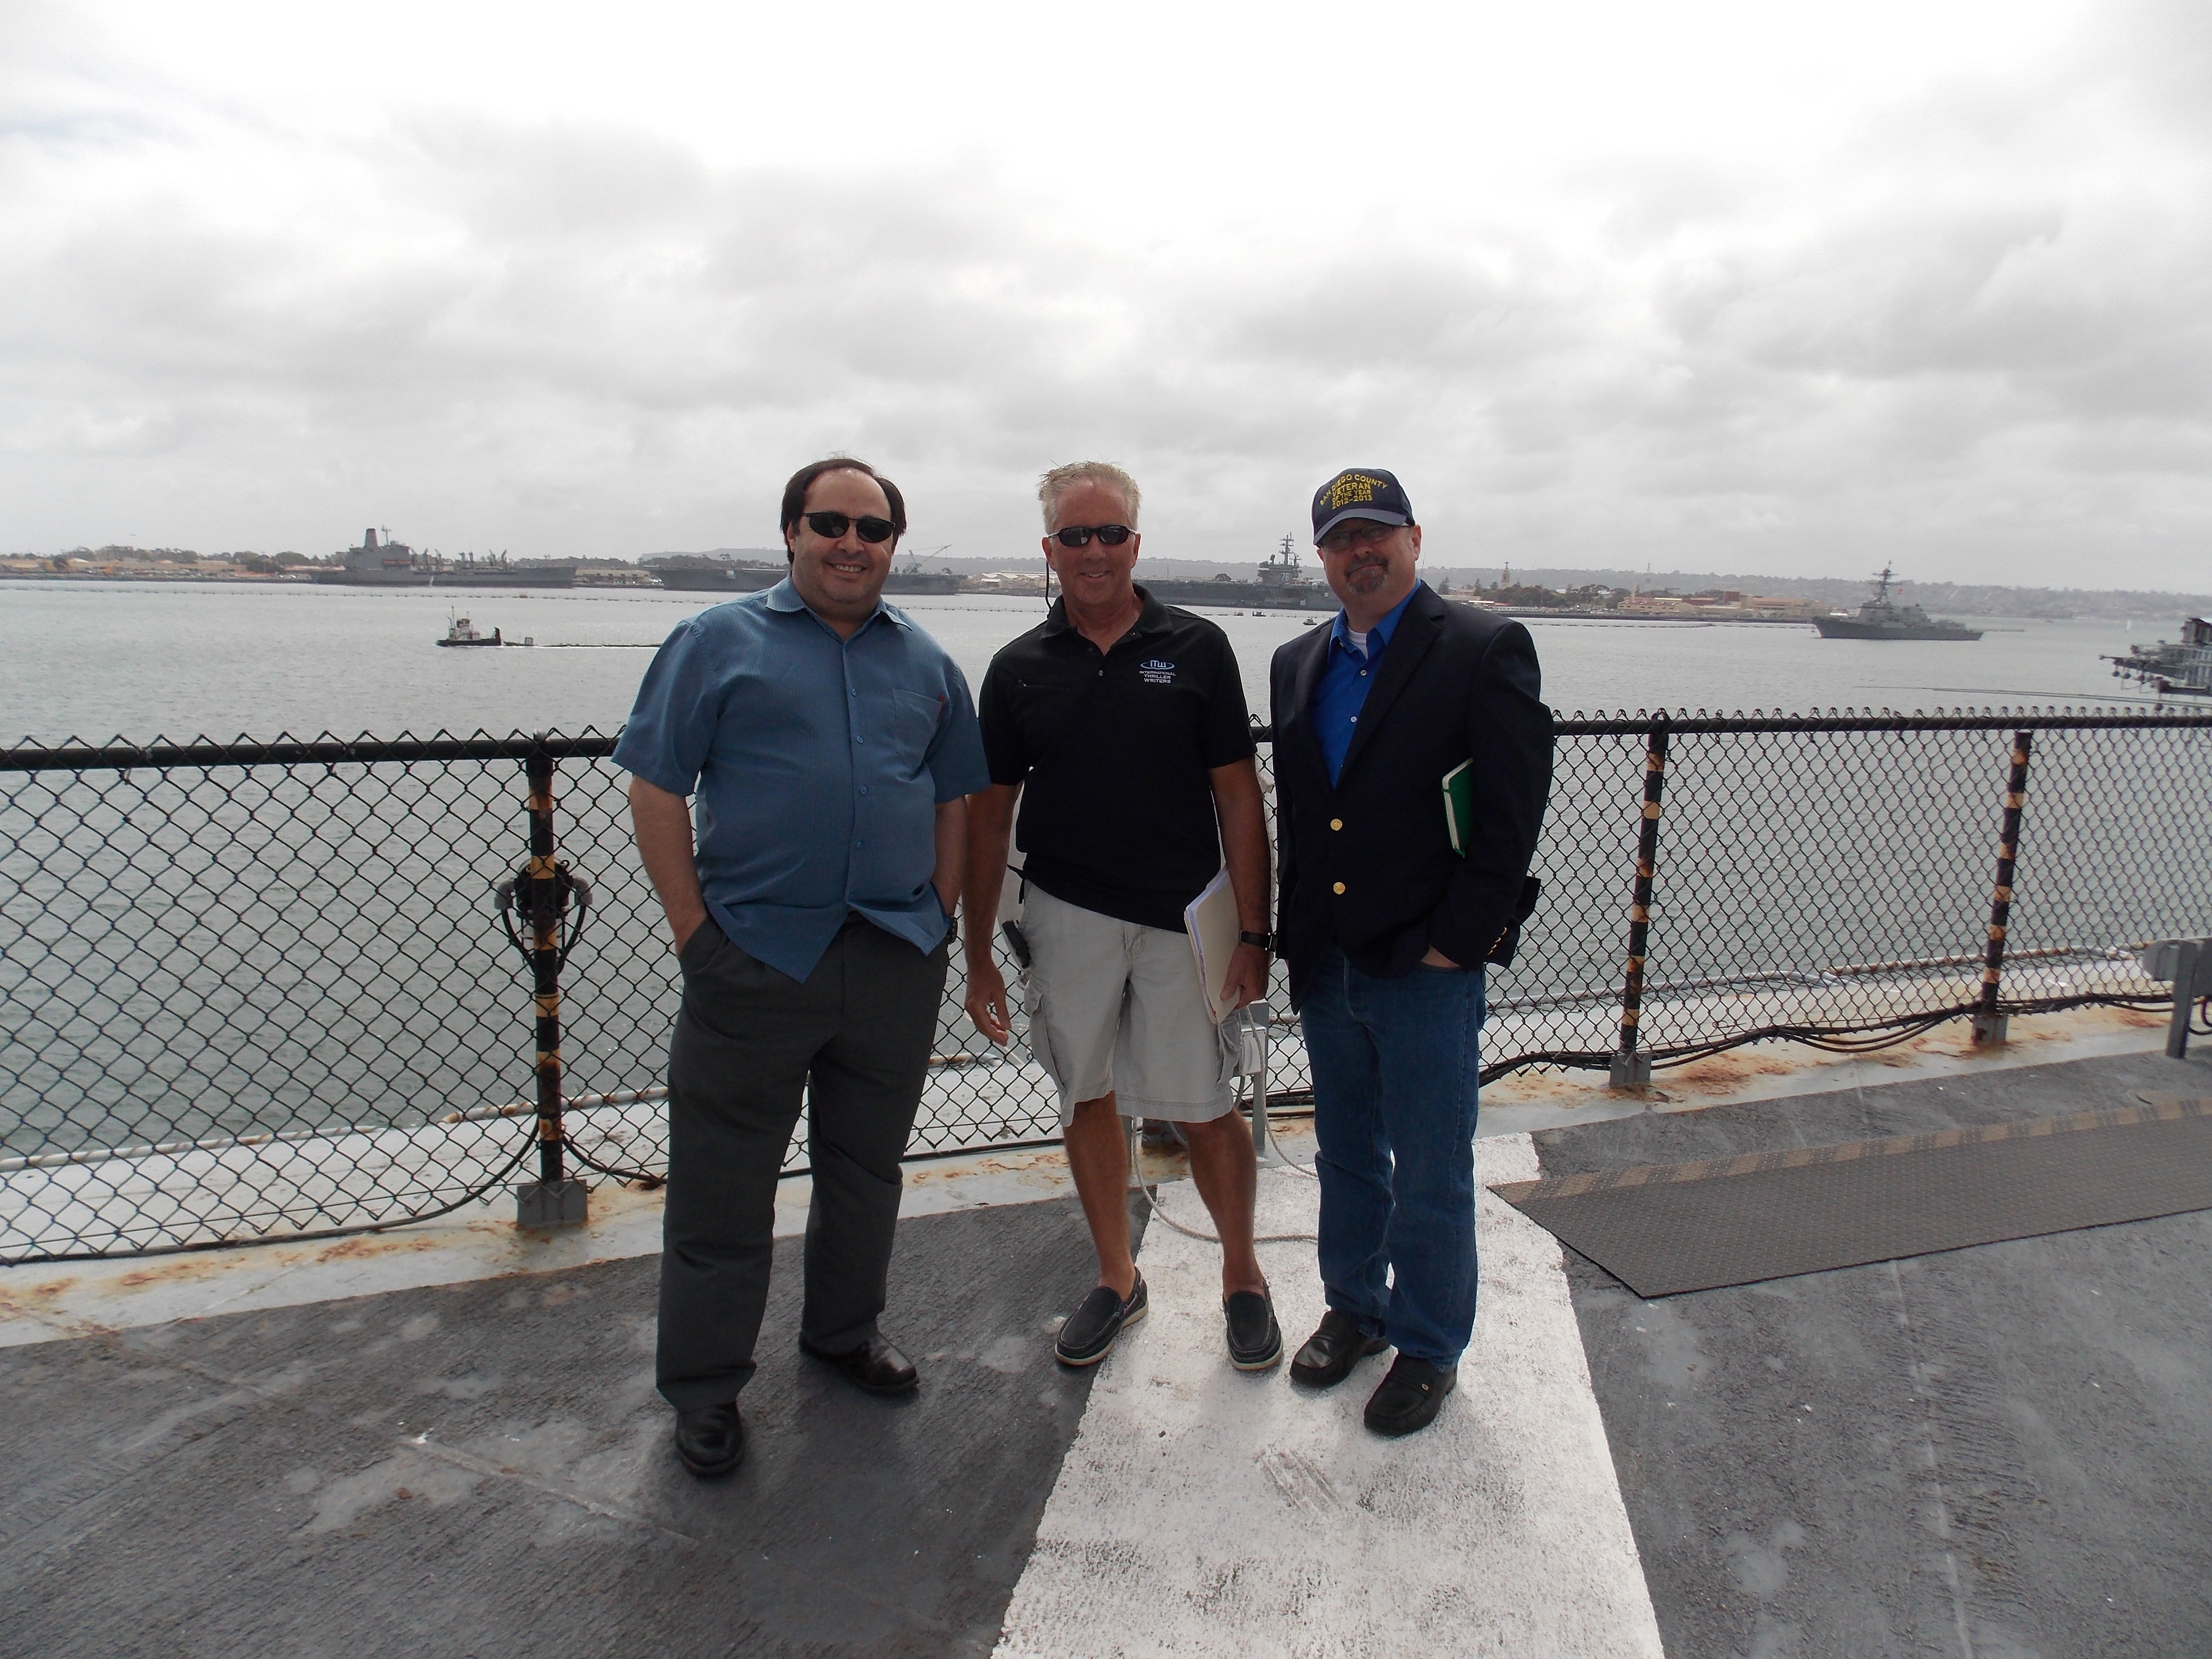 MBF Midway mtg 25 Apr 2014 079